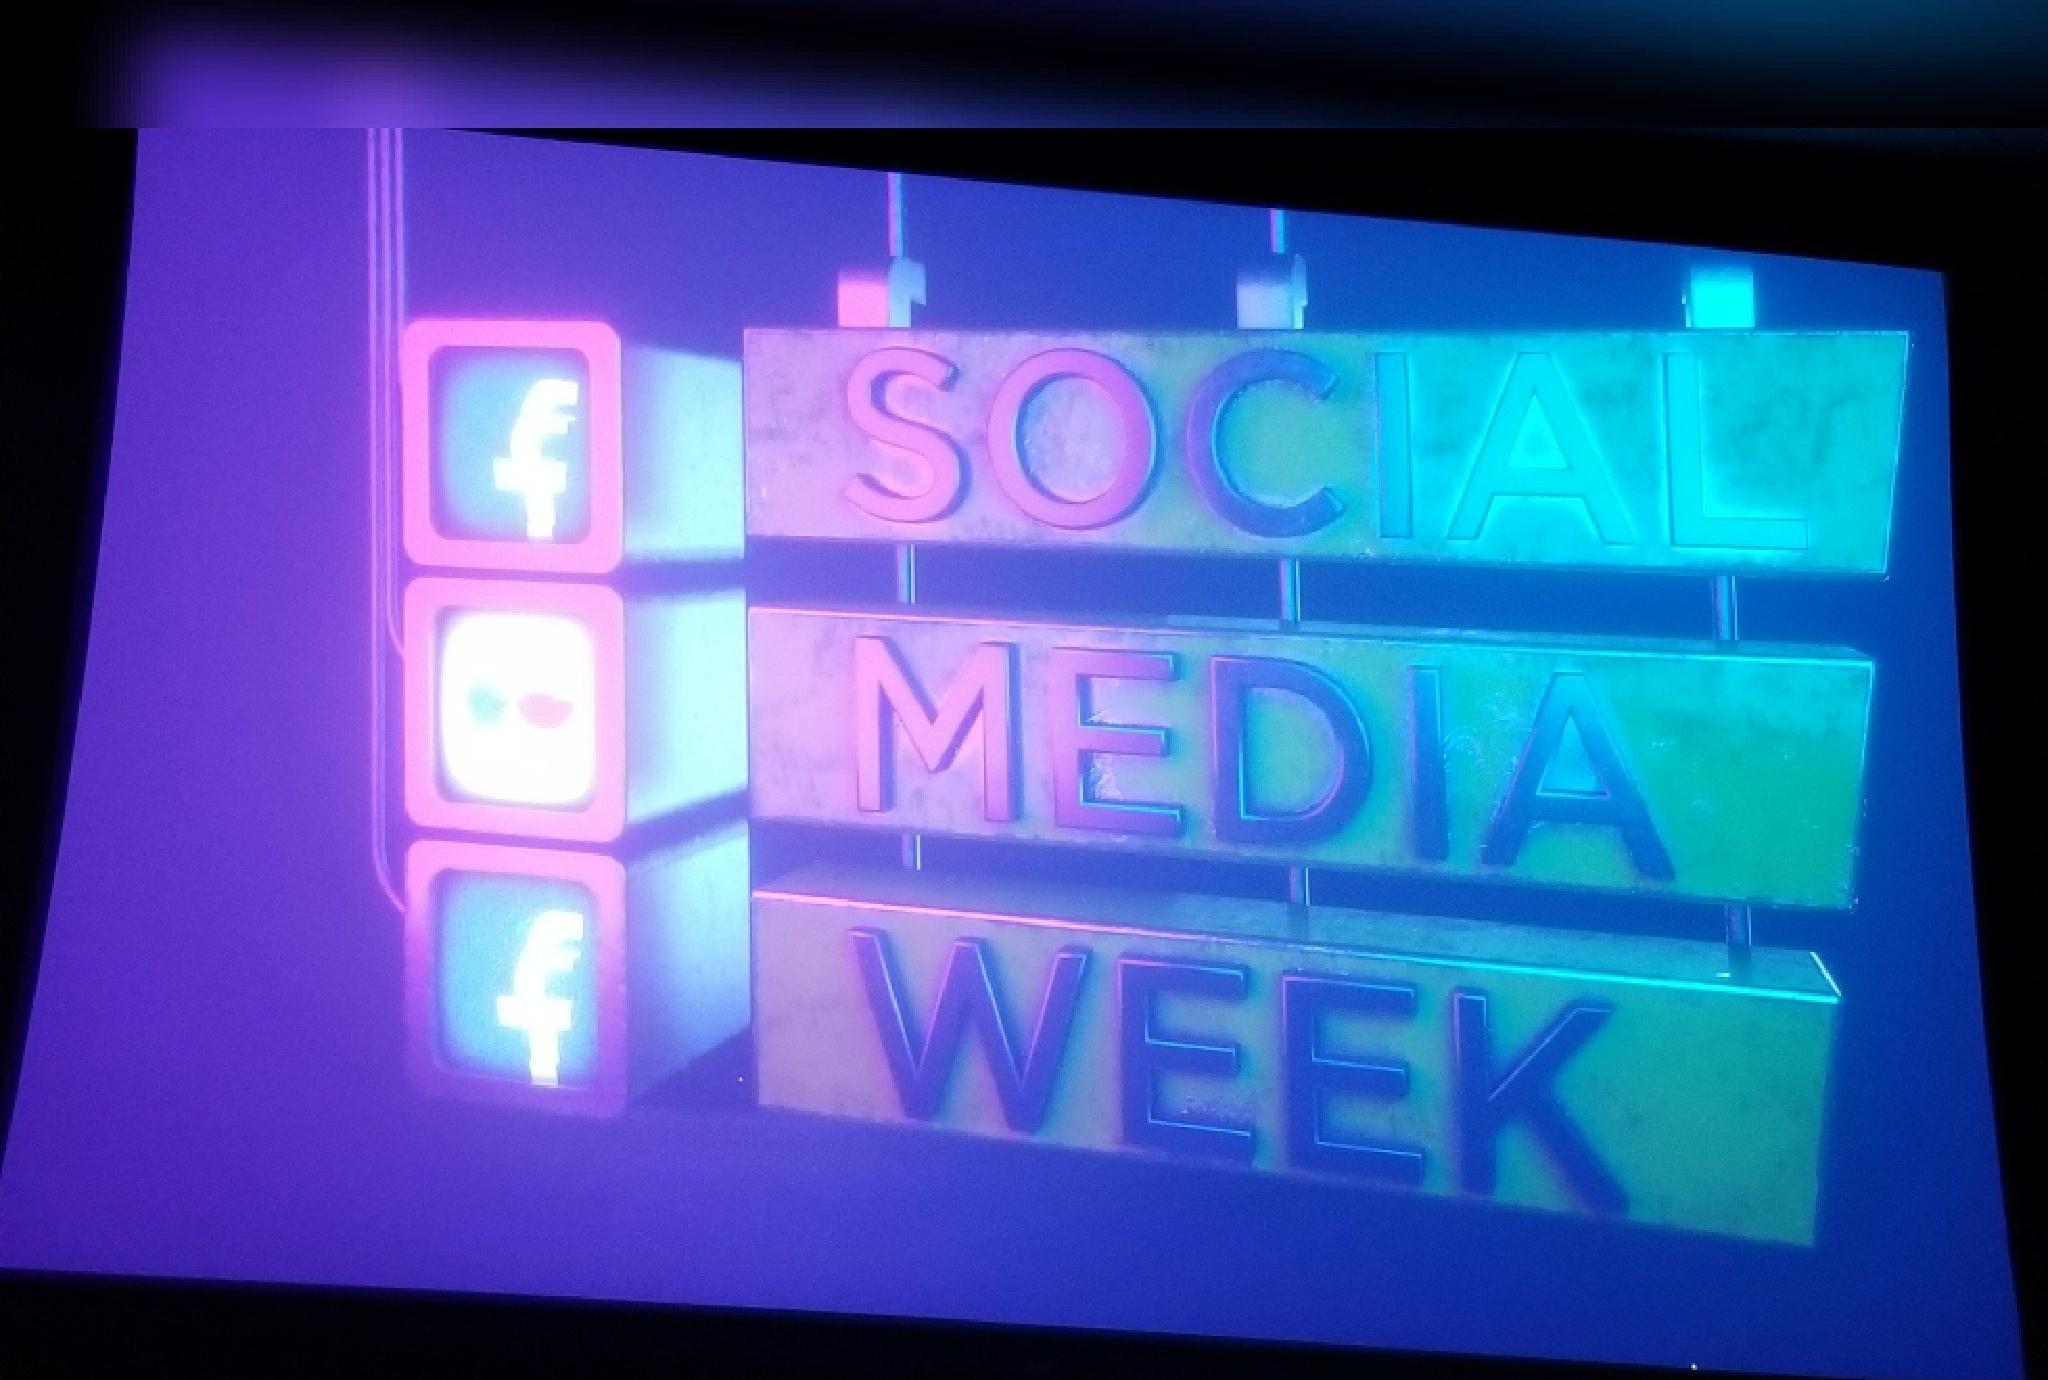 B2B Marketing Lessons From Social Media Week New York